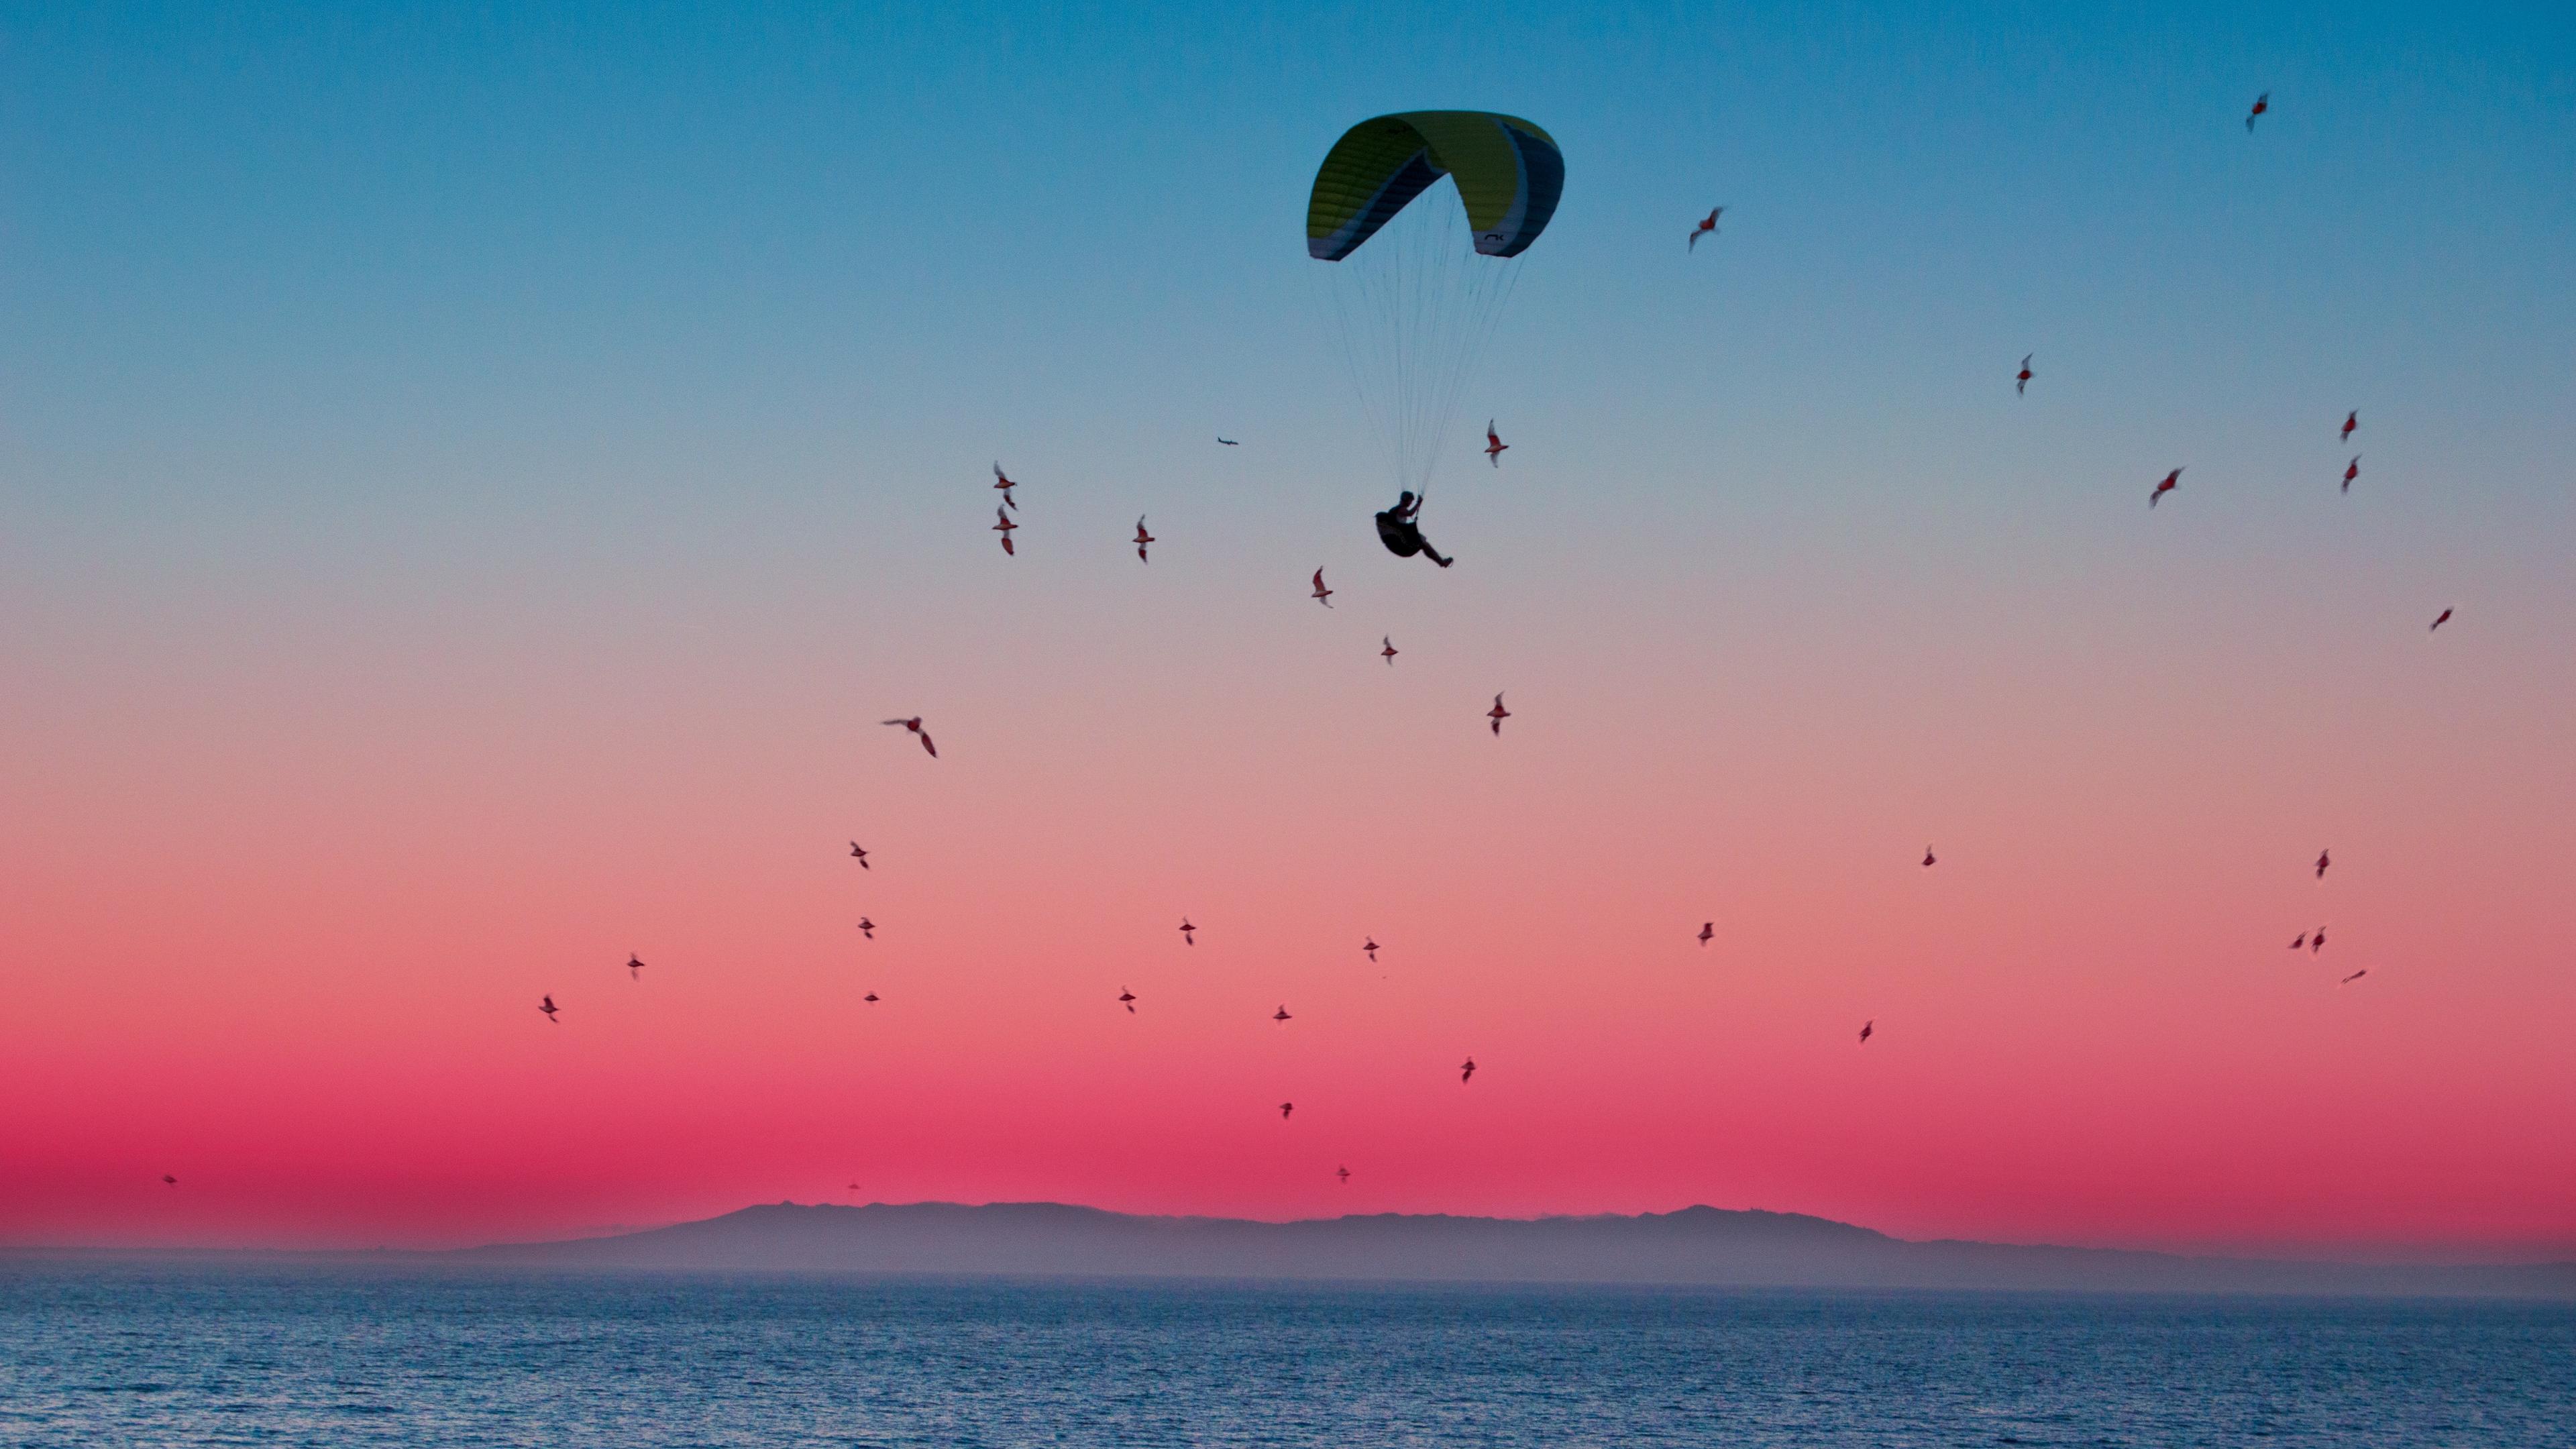 paragliding parachute sea flight birds horizon 4k 1540063429 - paragliding, parachute, sea, flight, birds, horizon 4k - Sea, paragliding, parachute